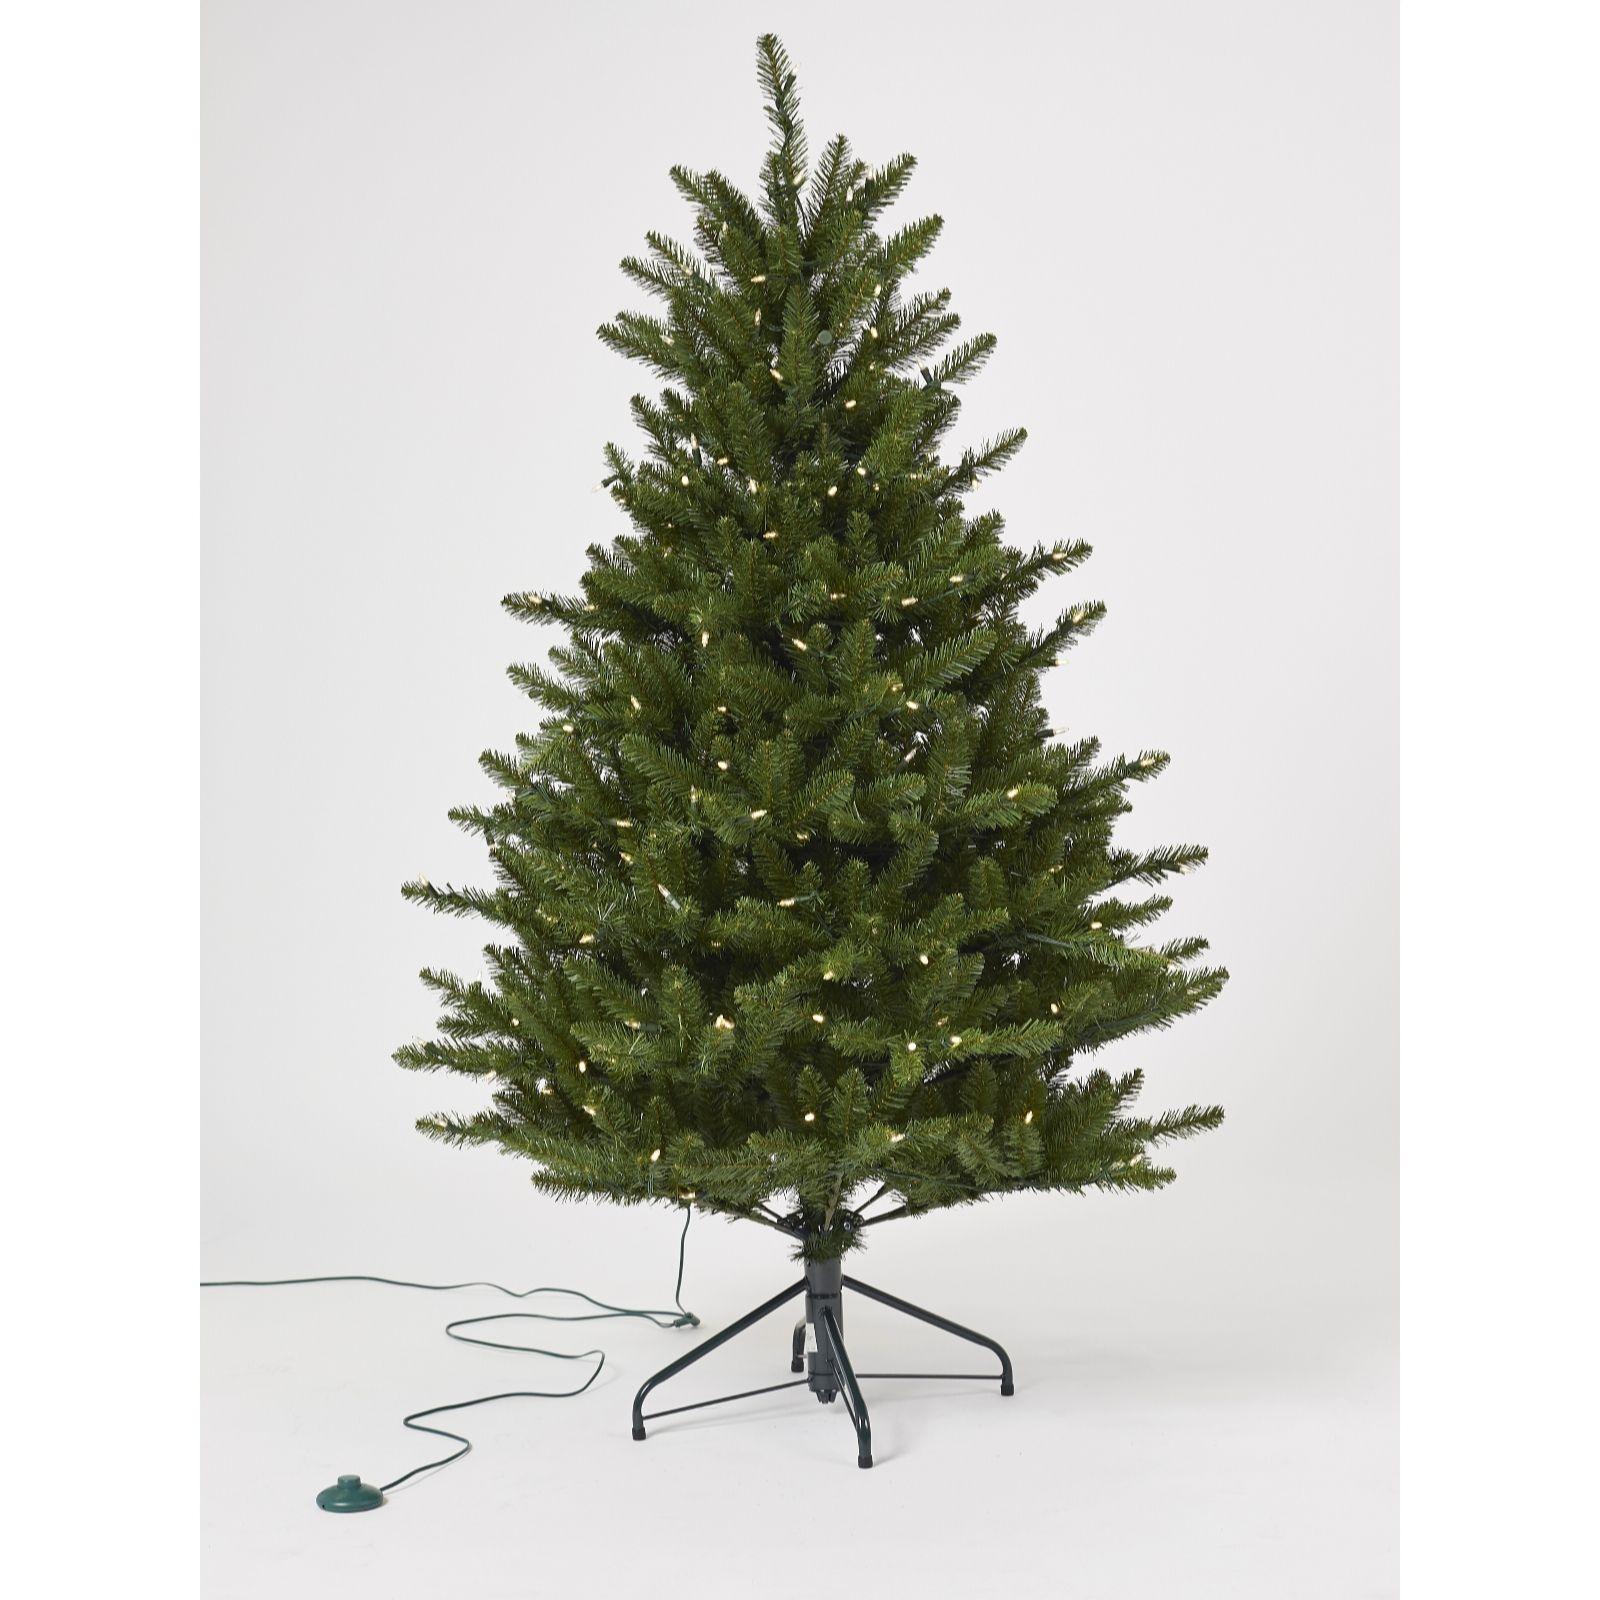 White Fir Christmas Tree: Santa's Best 5ft Fraiser Fir Christmas Tree With 240 Warm